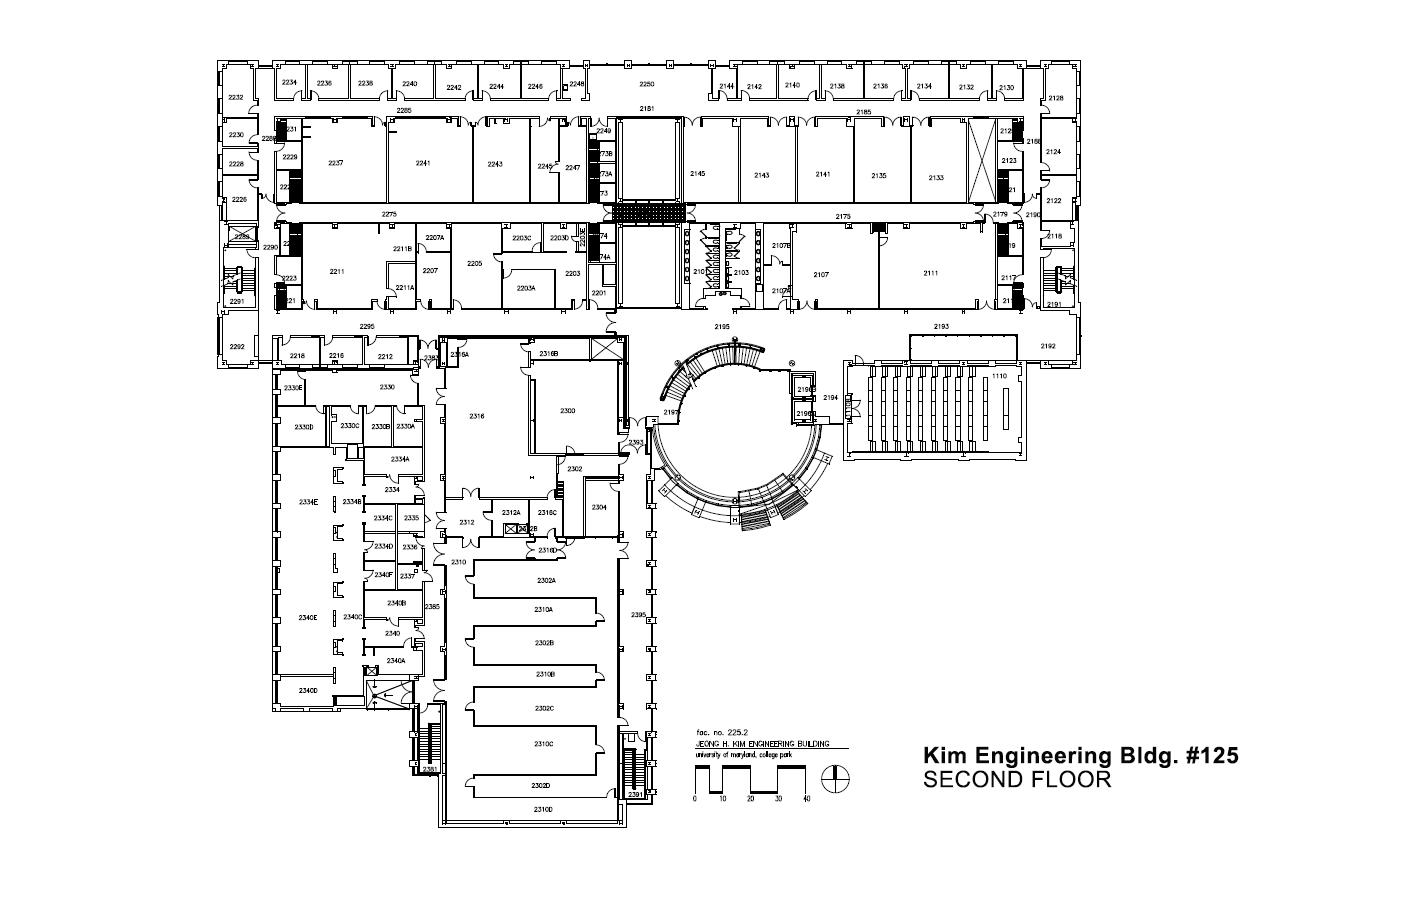 Pet Engineering Schematics Wow Electrical Wiring Diagrams Heyer Building Schematic Circuit And Diagram Hub U2022